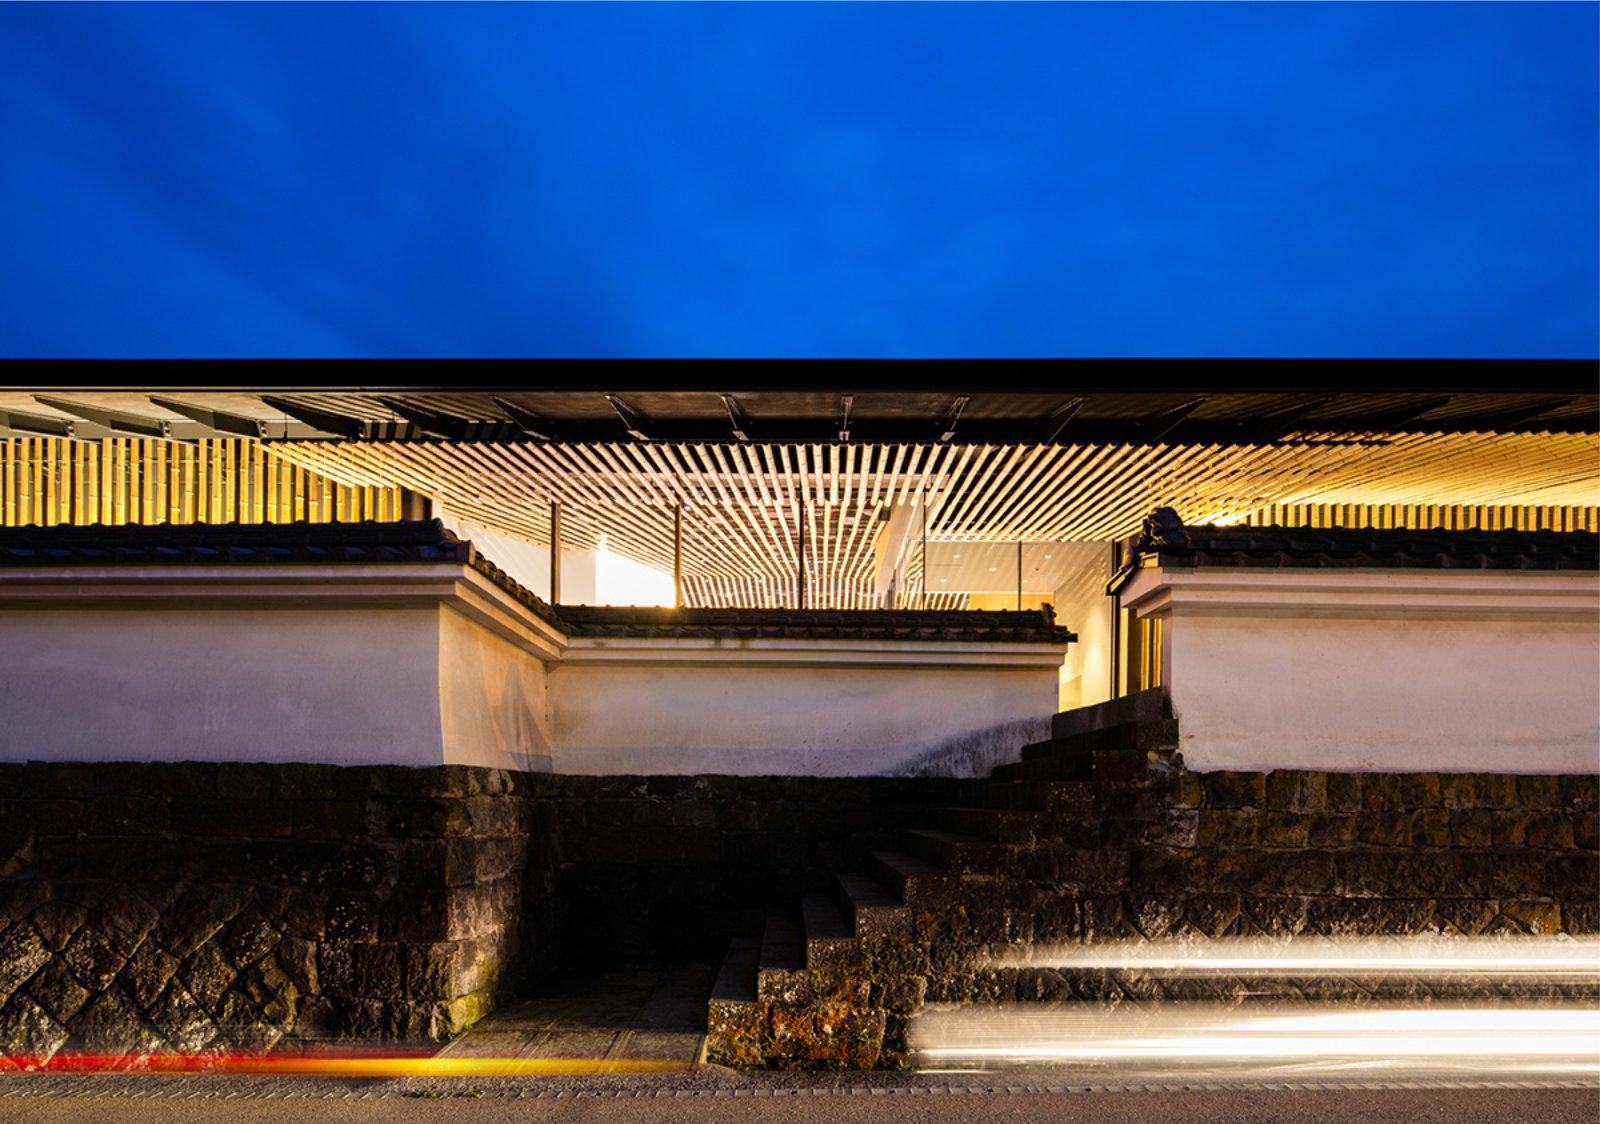 Taketa History and Culture